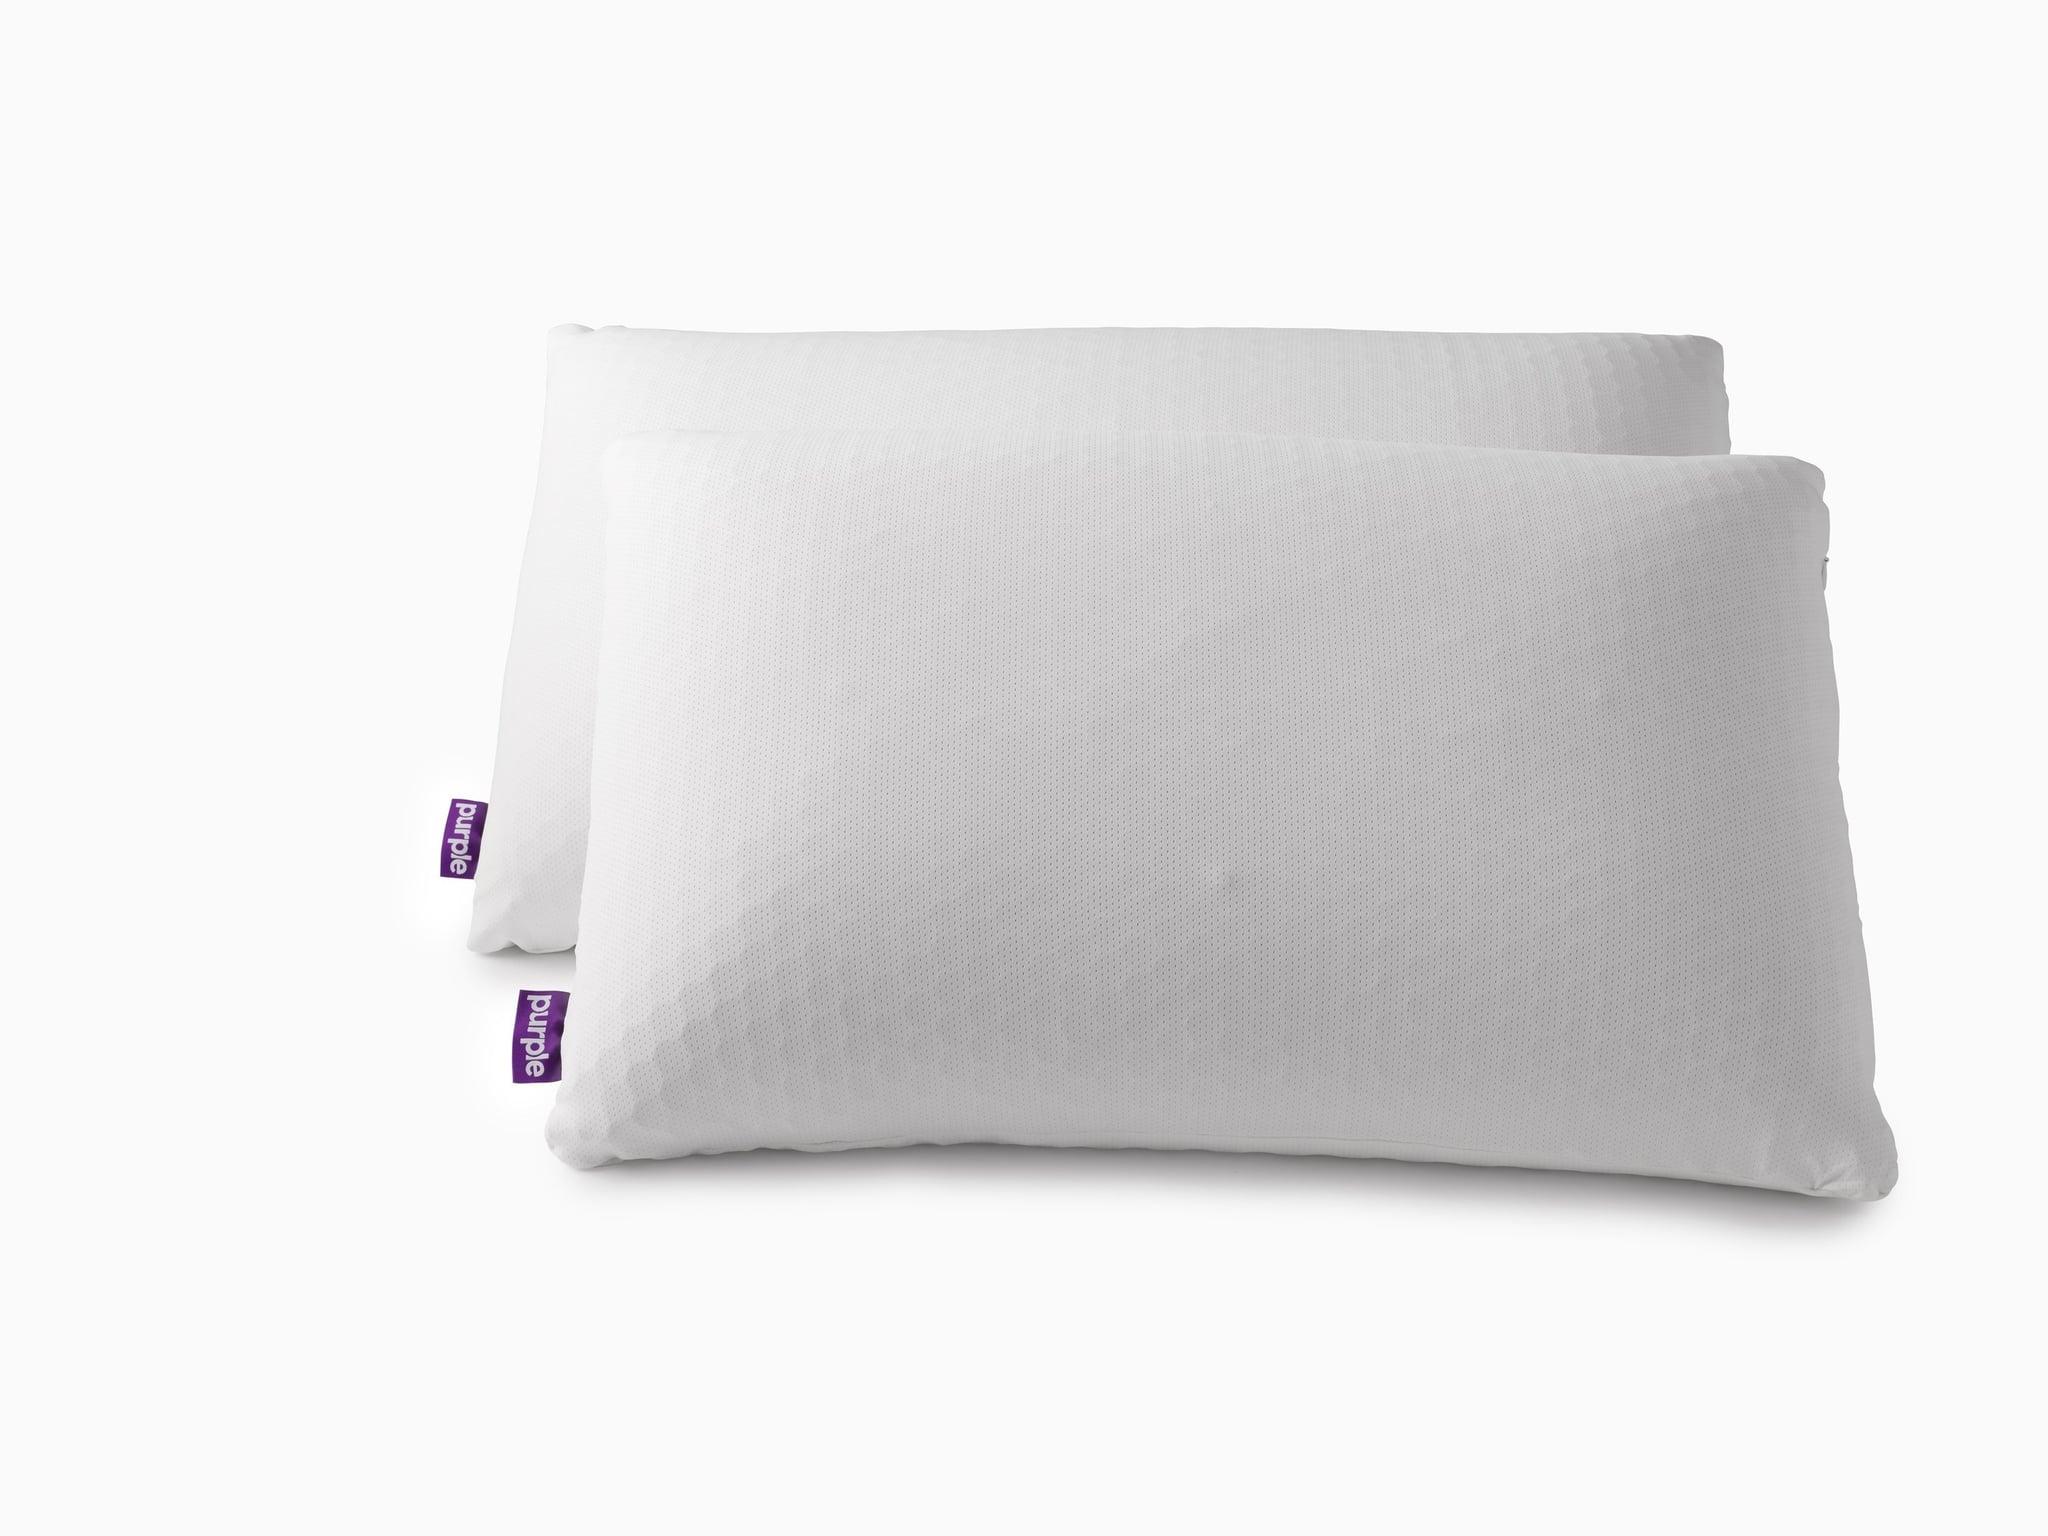 The Purple Harmony Pillow